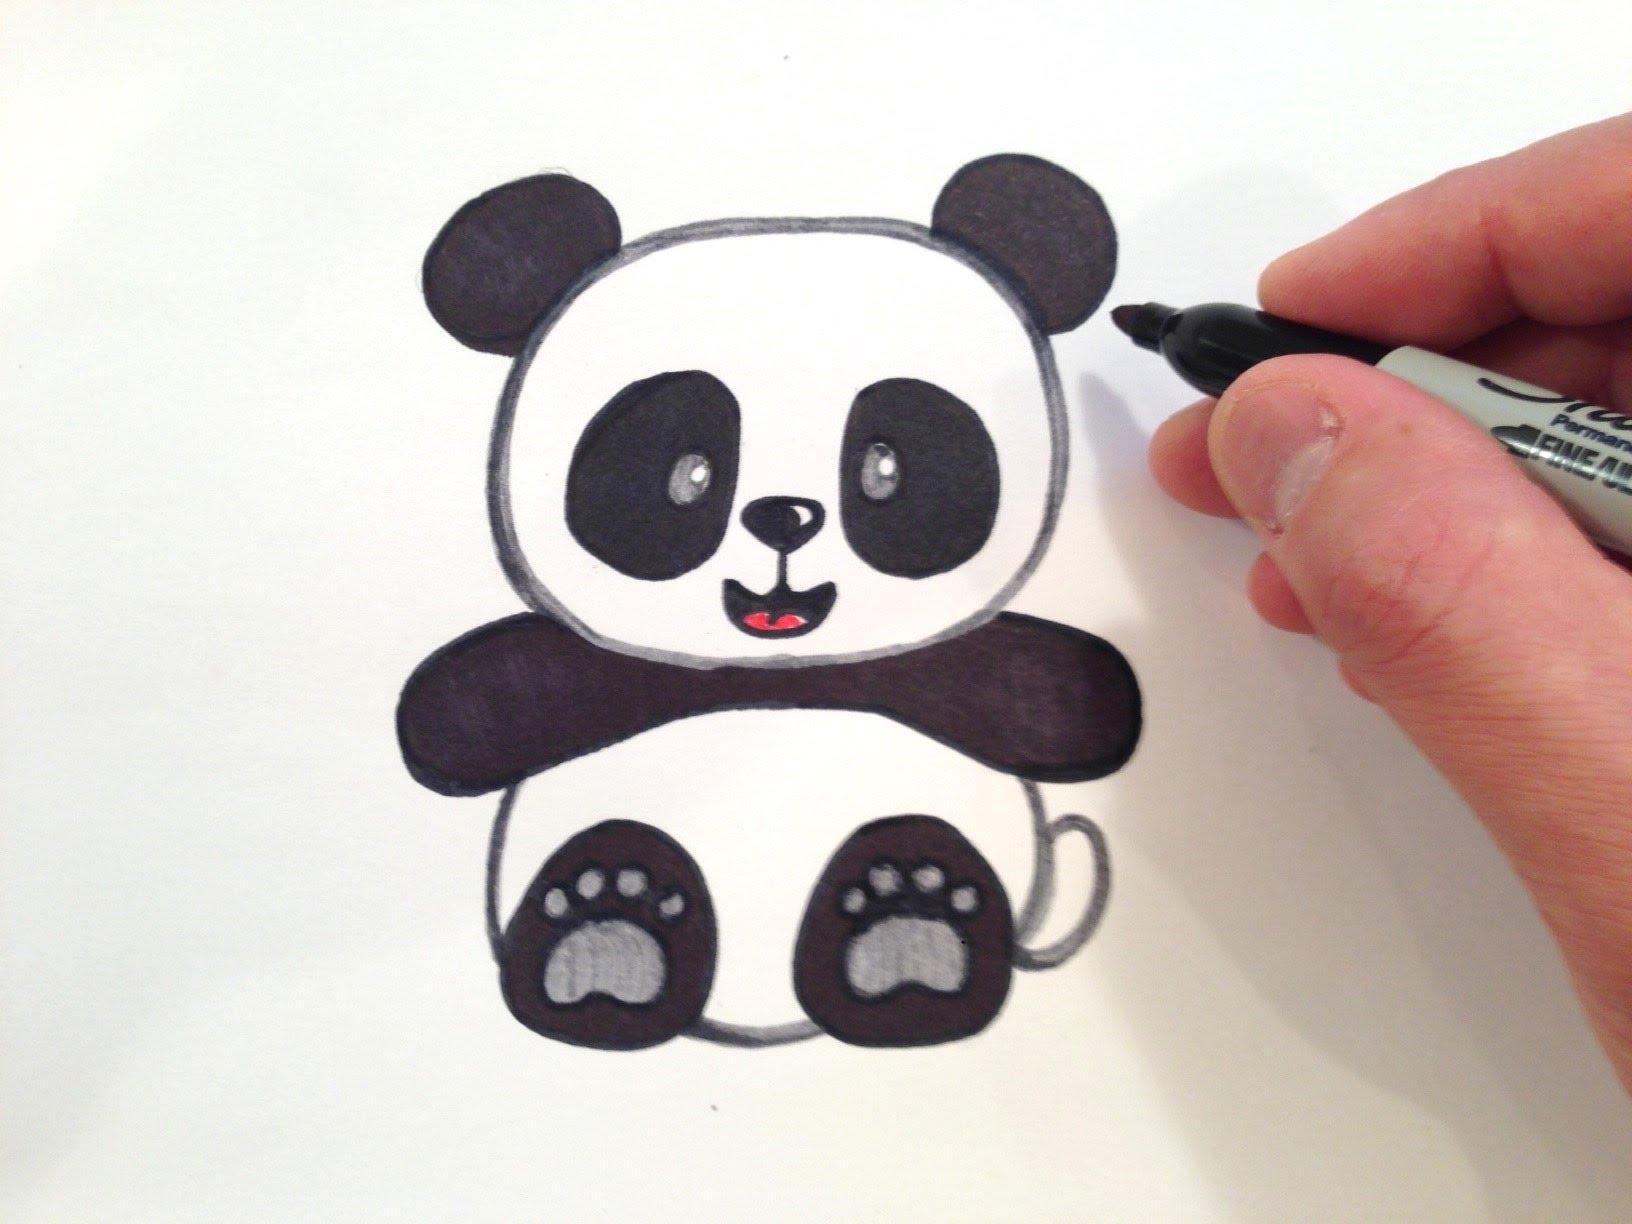 1632x1224 How To Draw A Cute Panda Bear